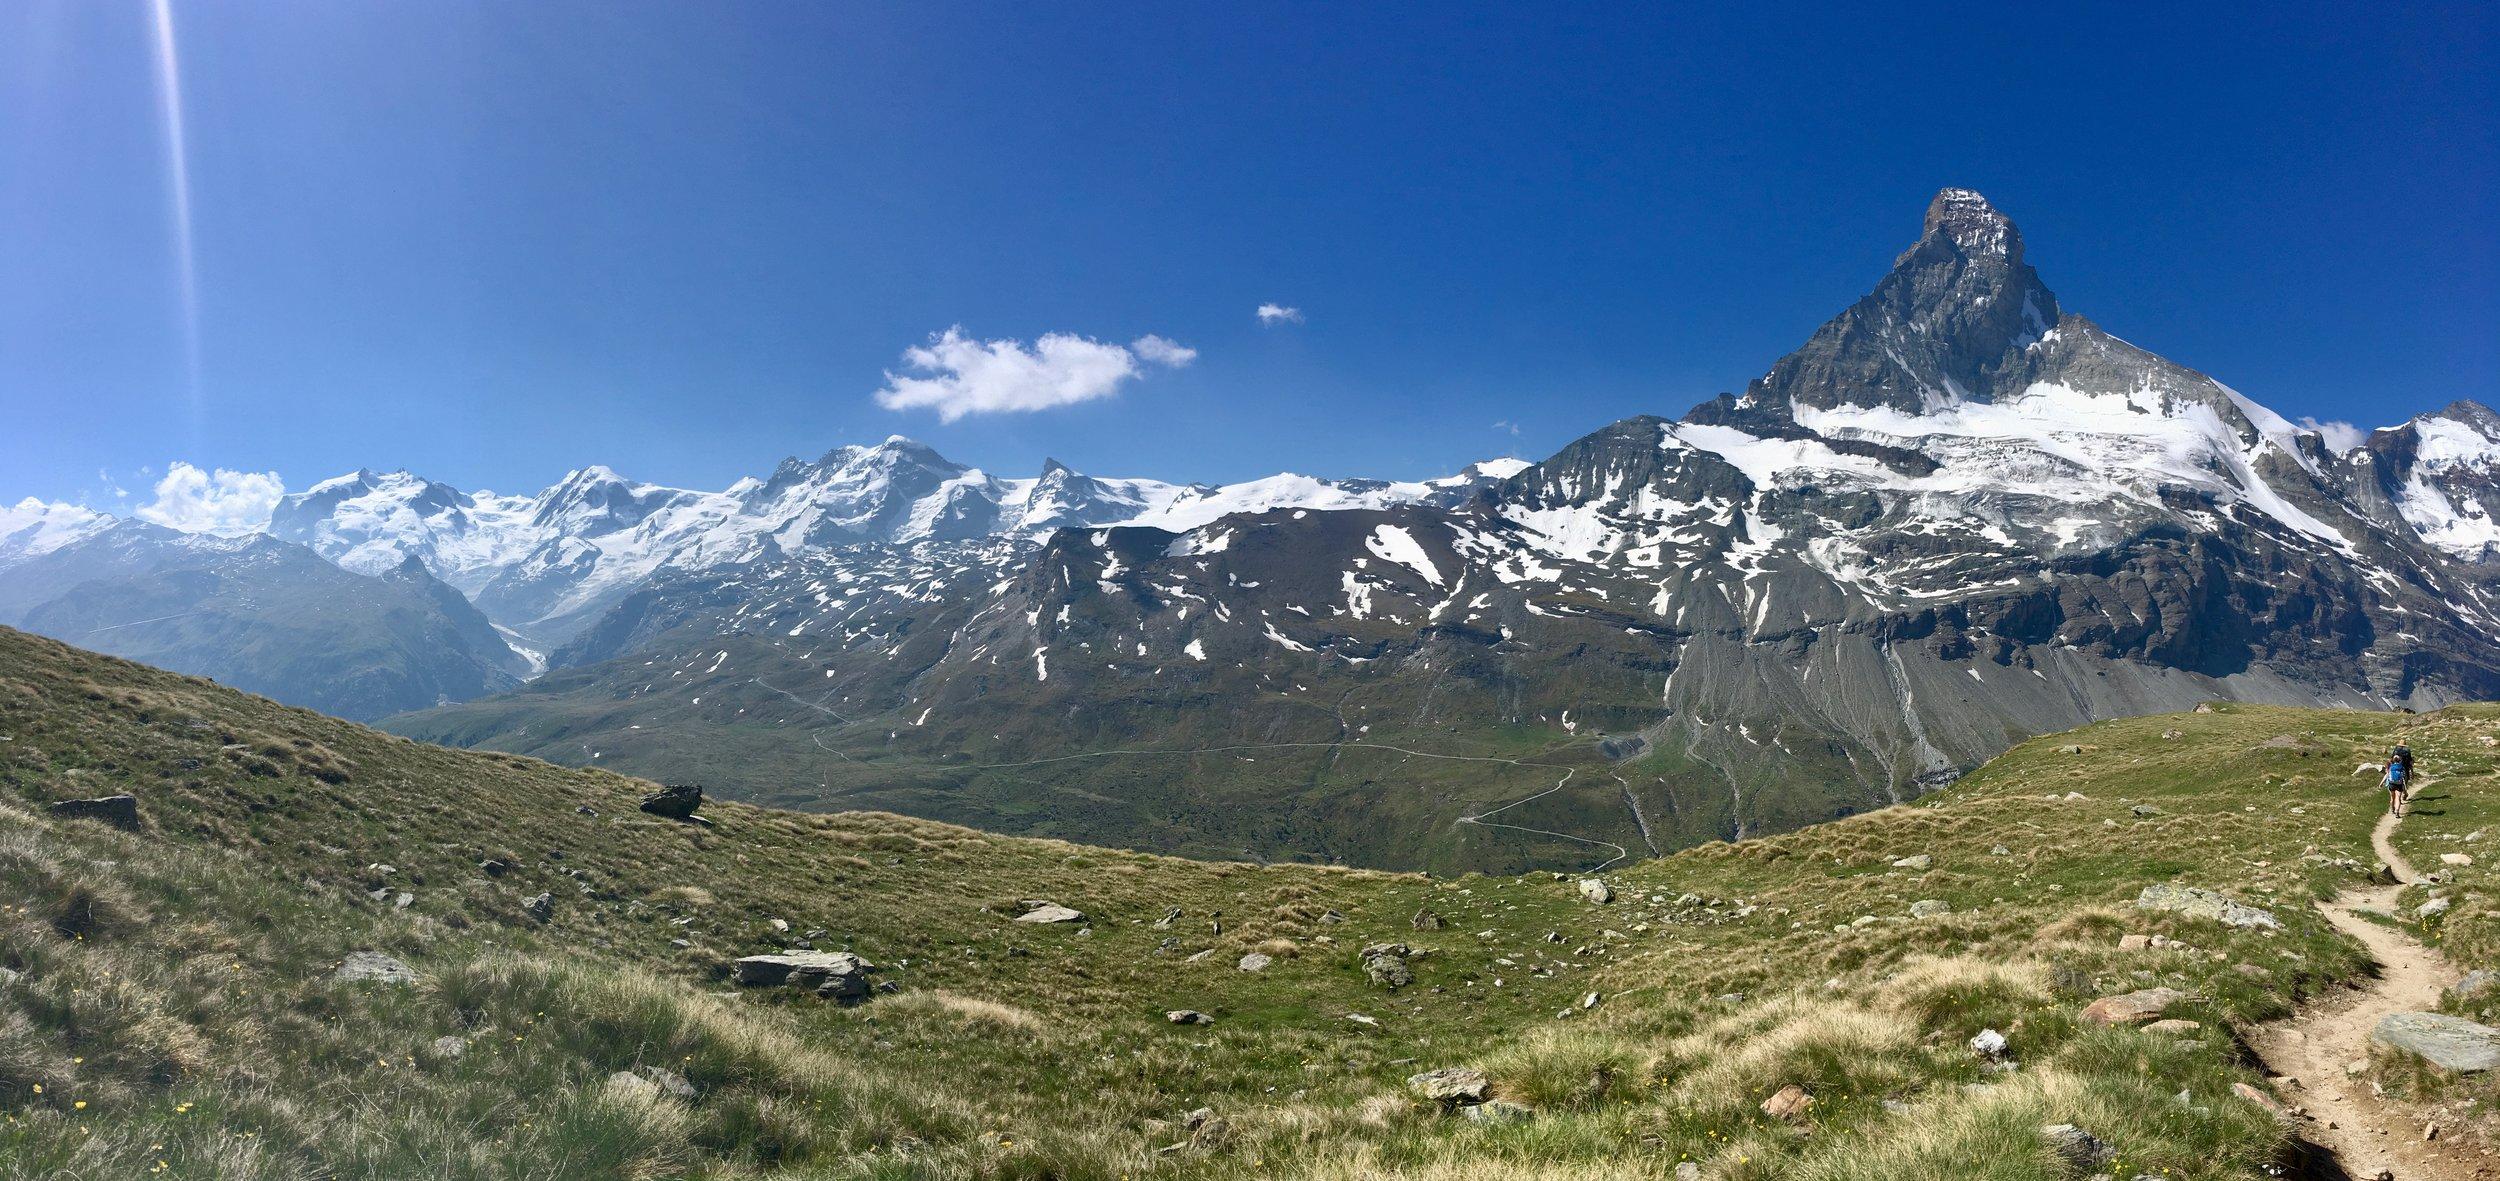 The Matterhorn- Zermatt, Switzerland